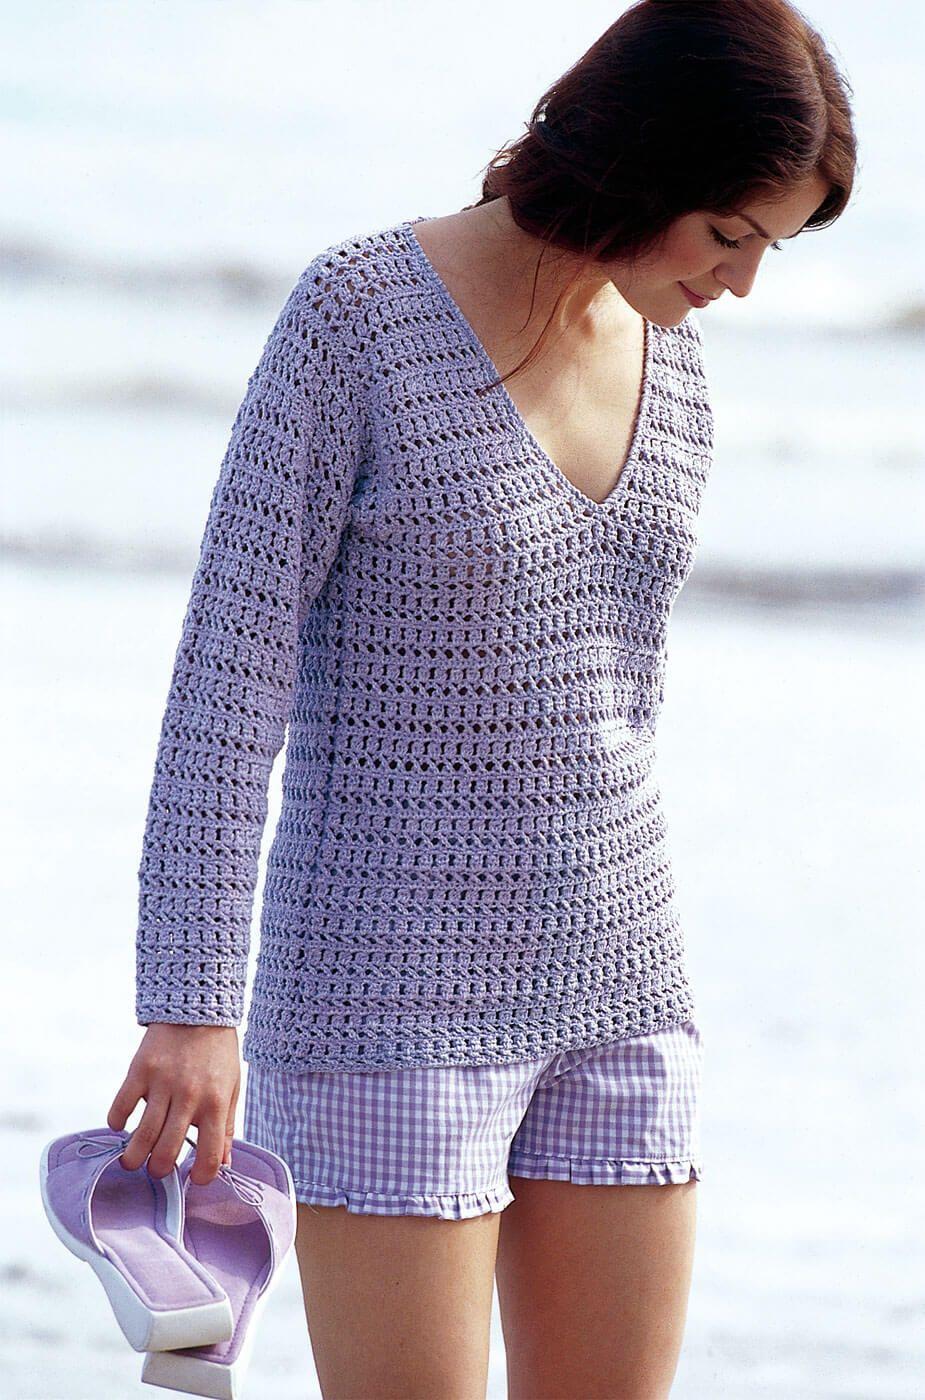 Gehäkelter Damen-Pullover mit V-Ausschnitt | Pinterest | Pullover ...